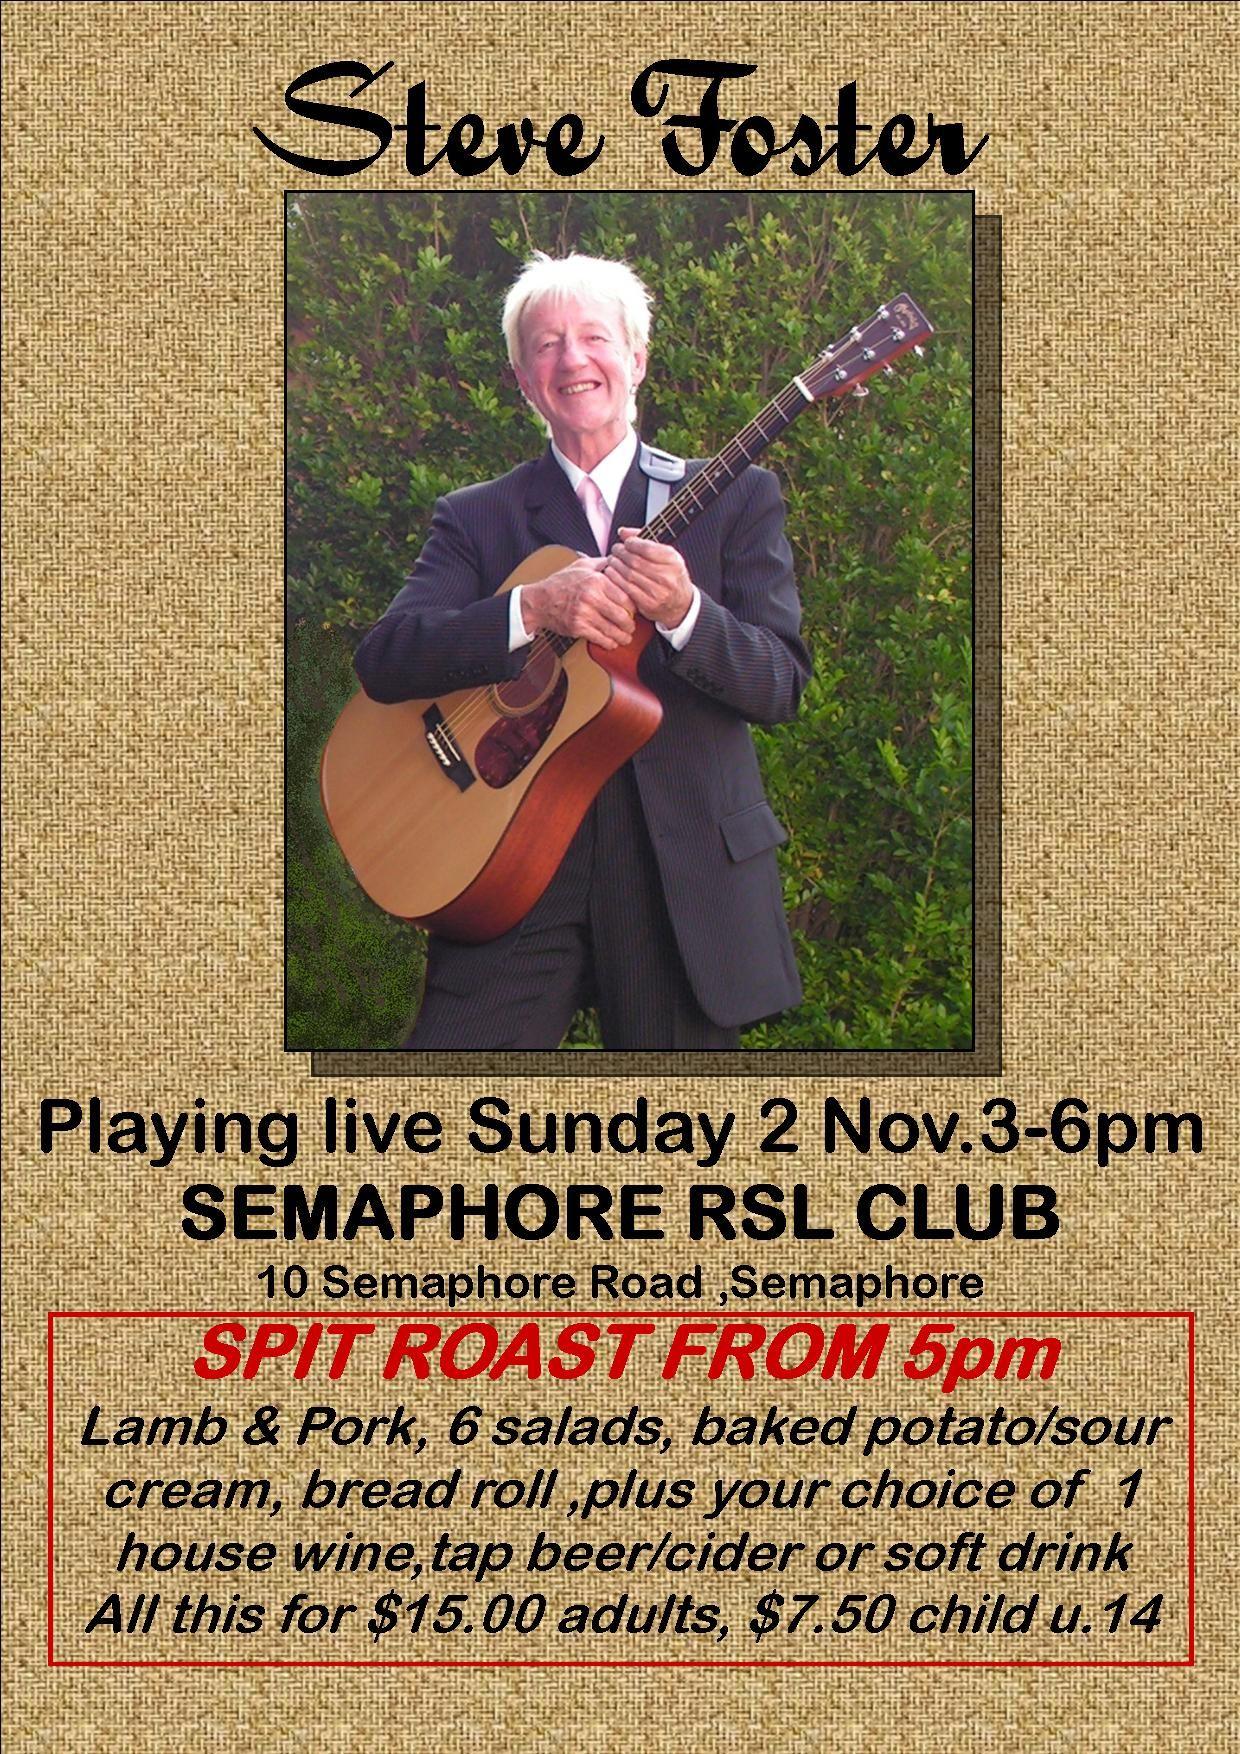 Semaphore RSL